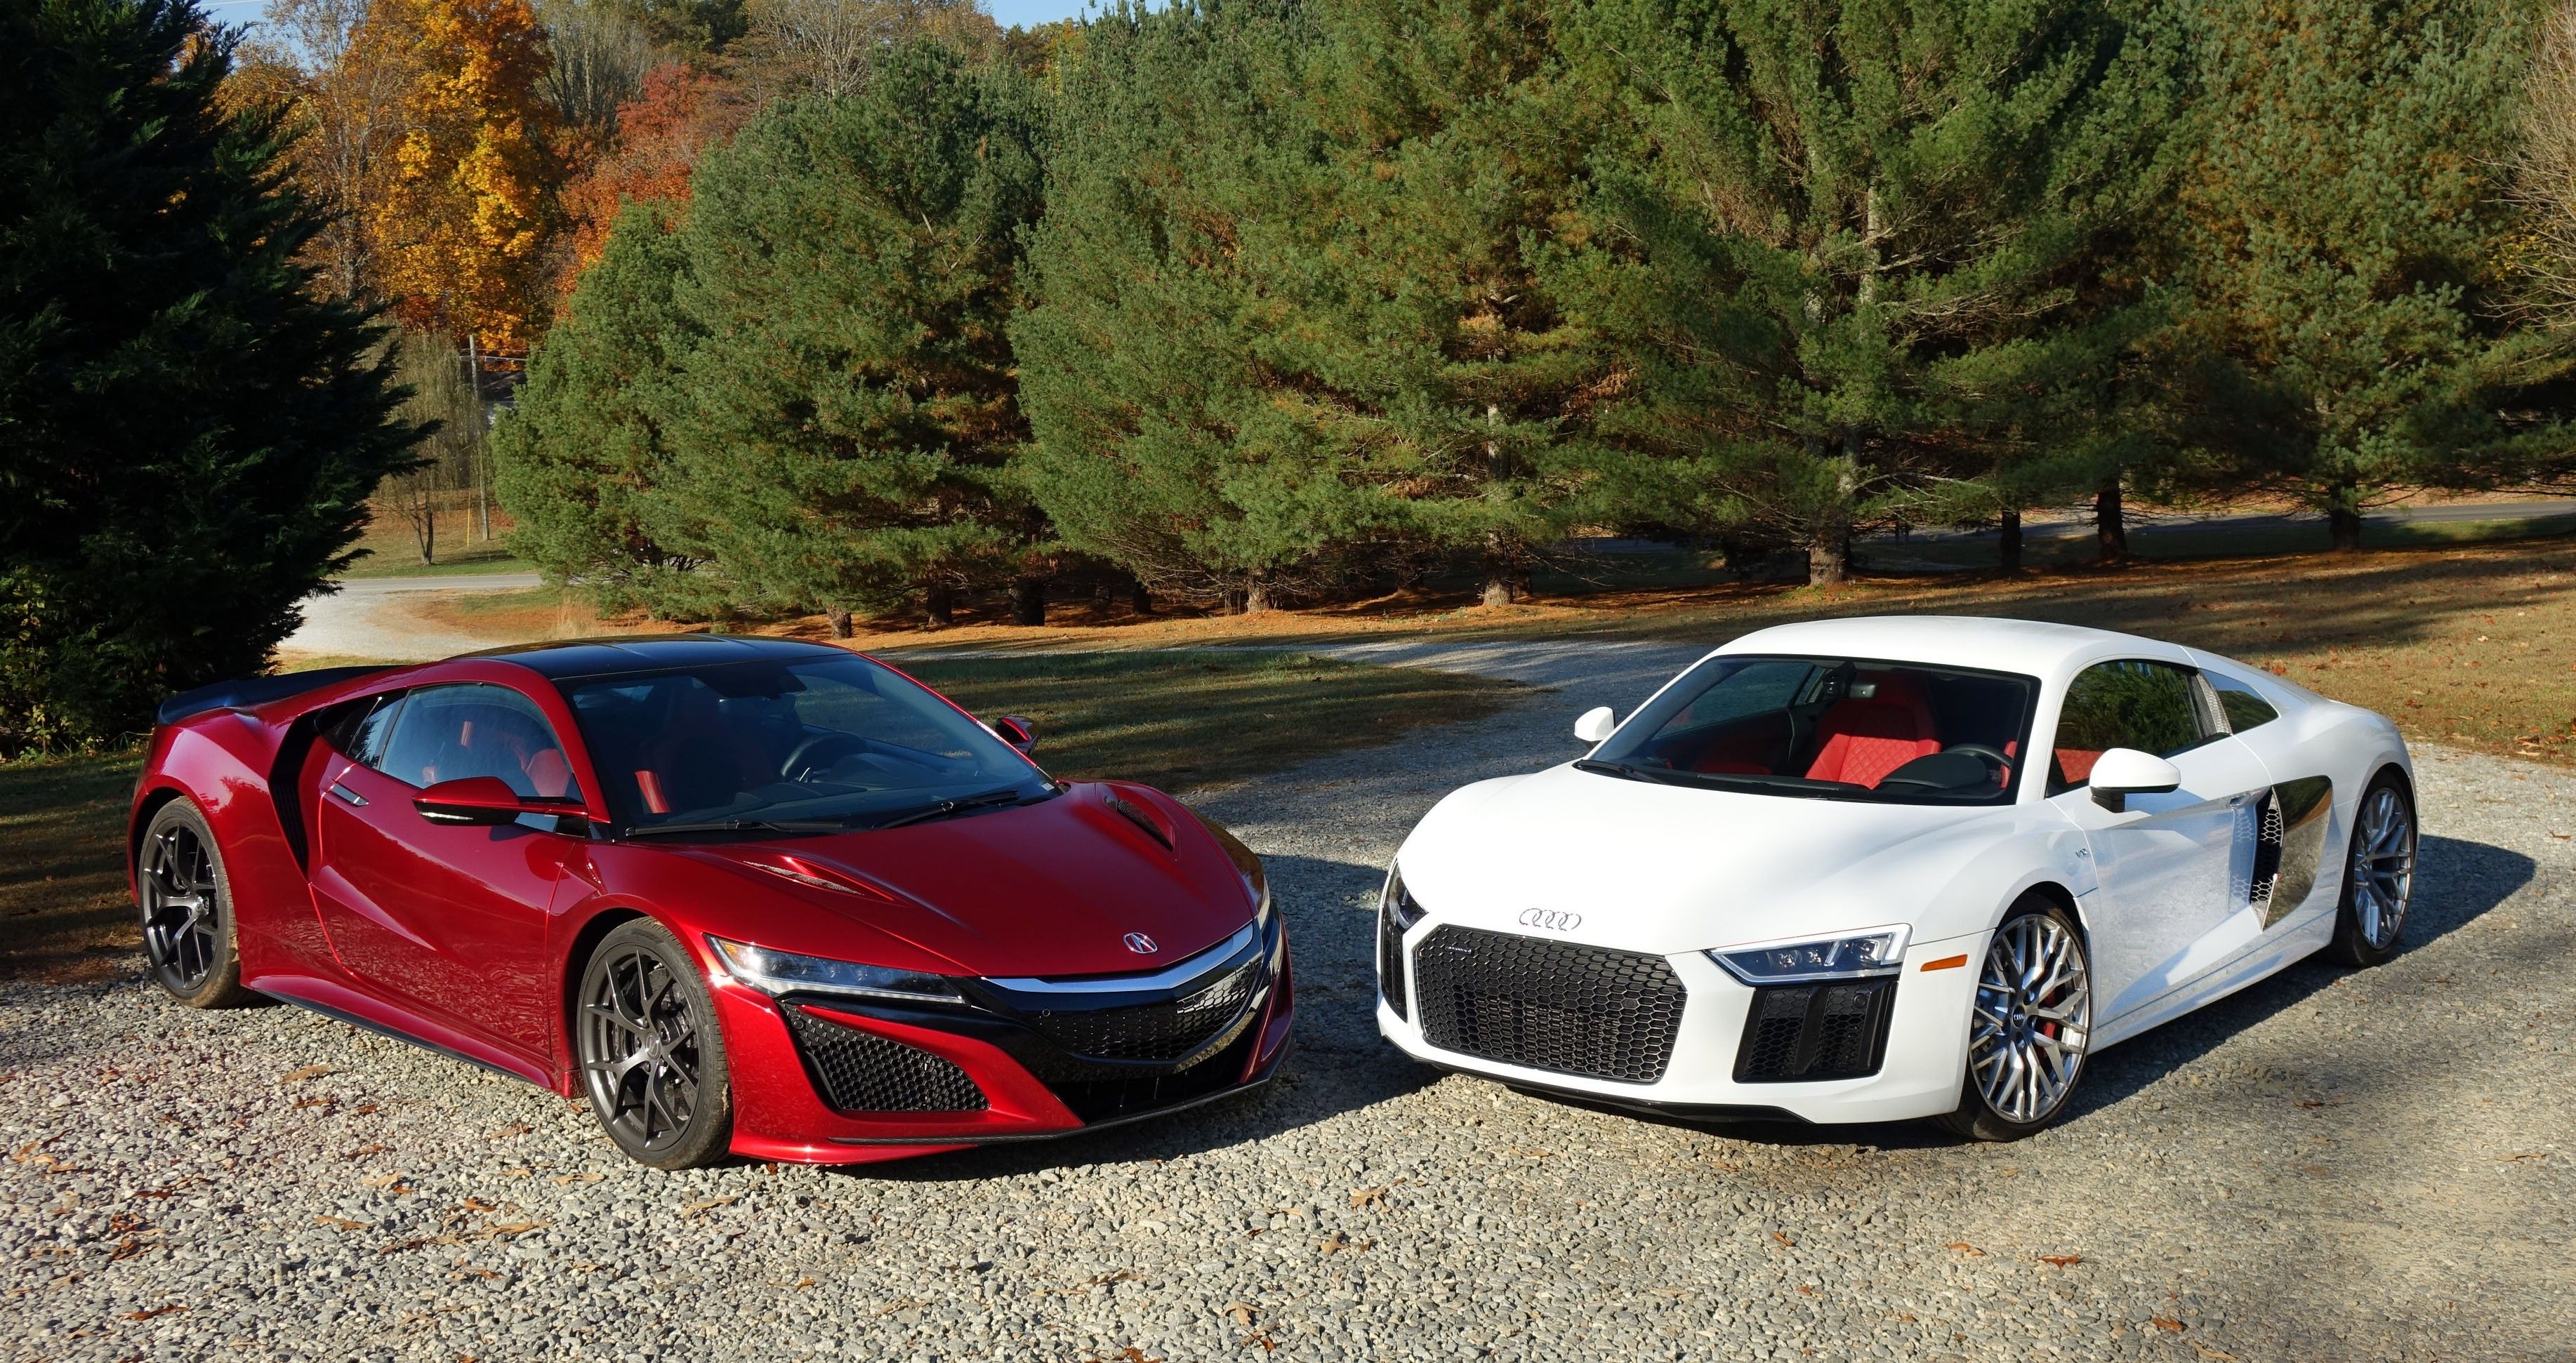 2019 audi r8 top speed spy shoot | japanese cars honda | pinterest